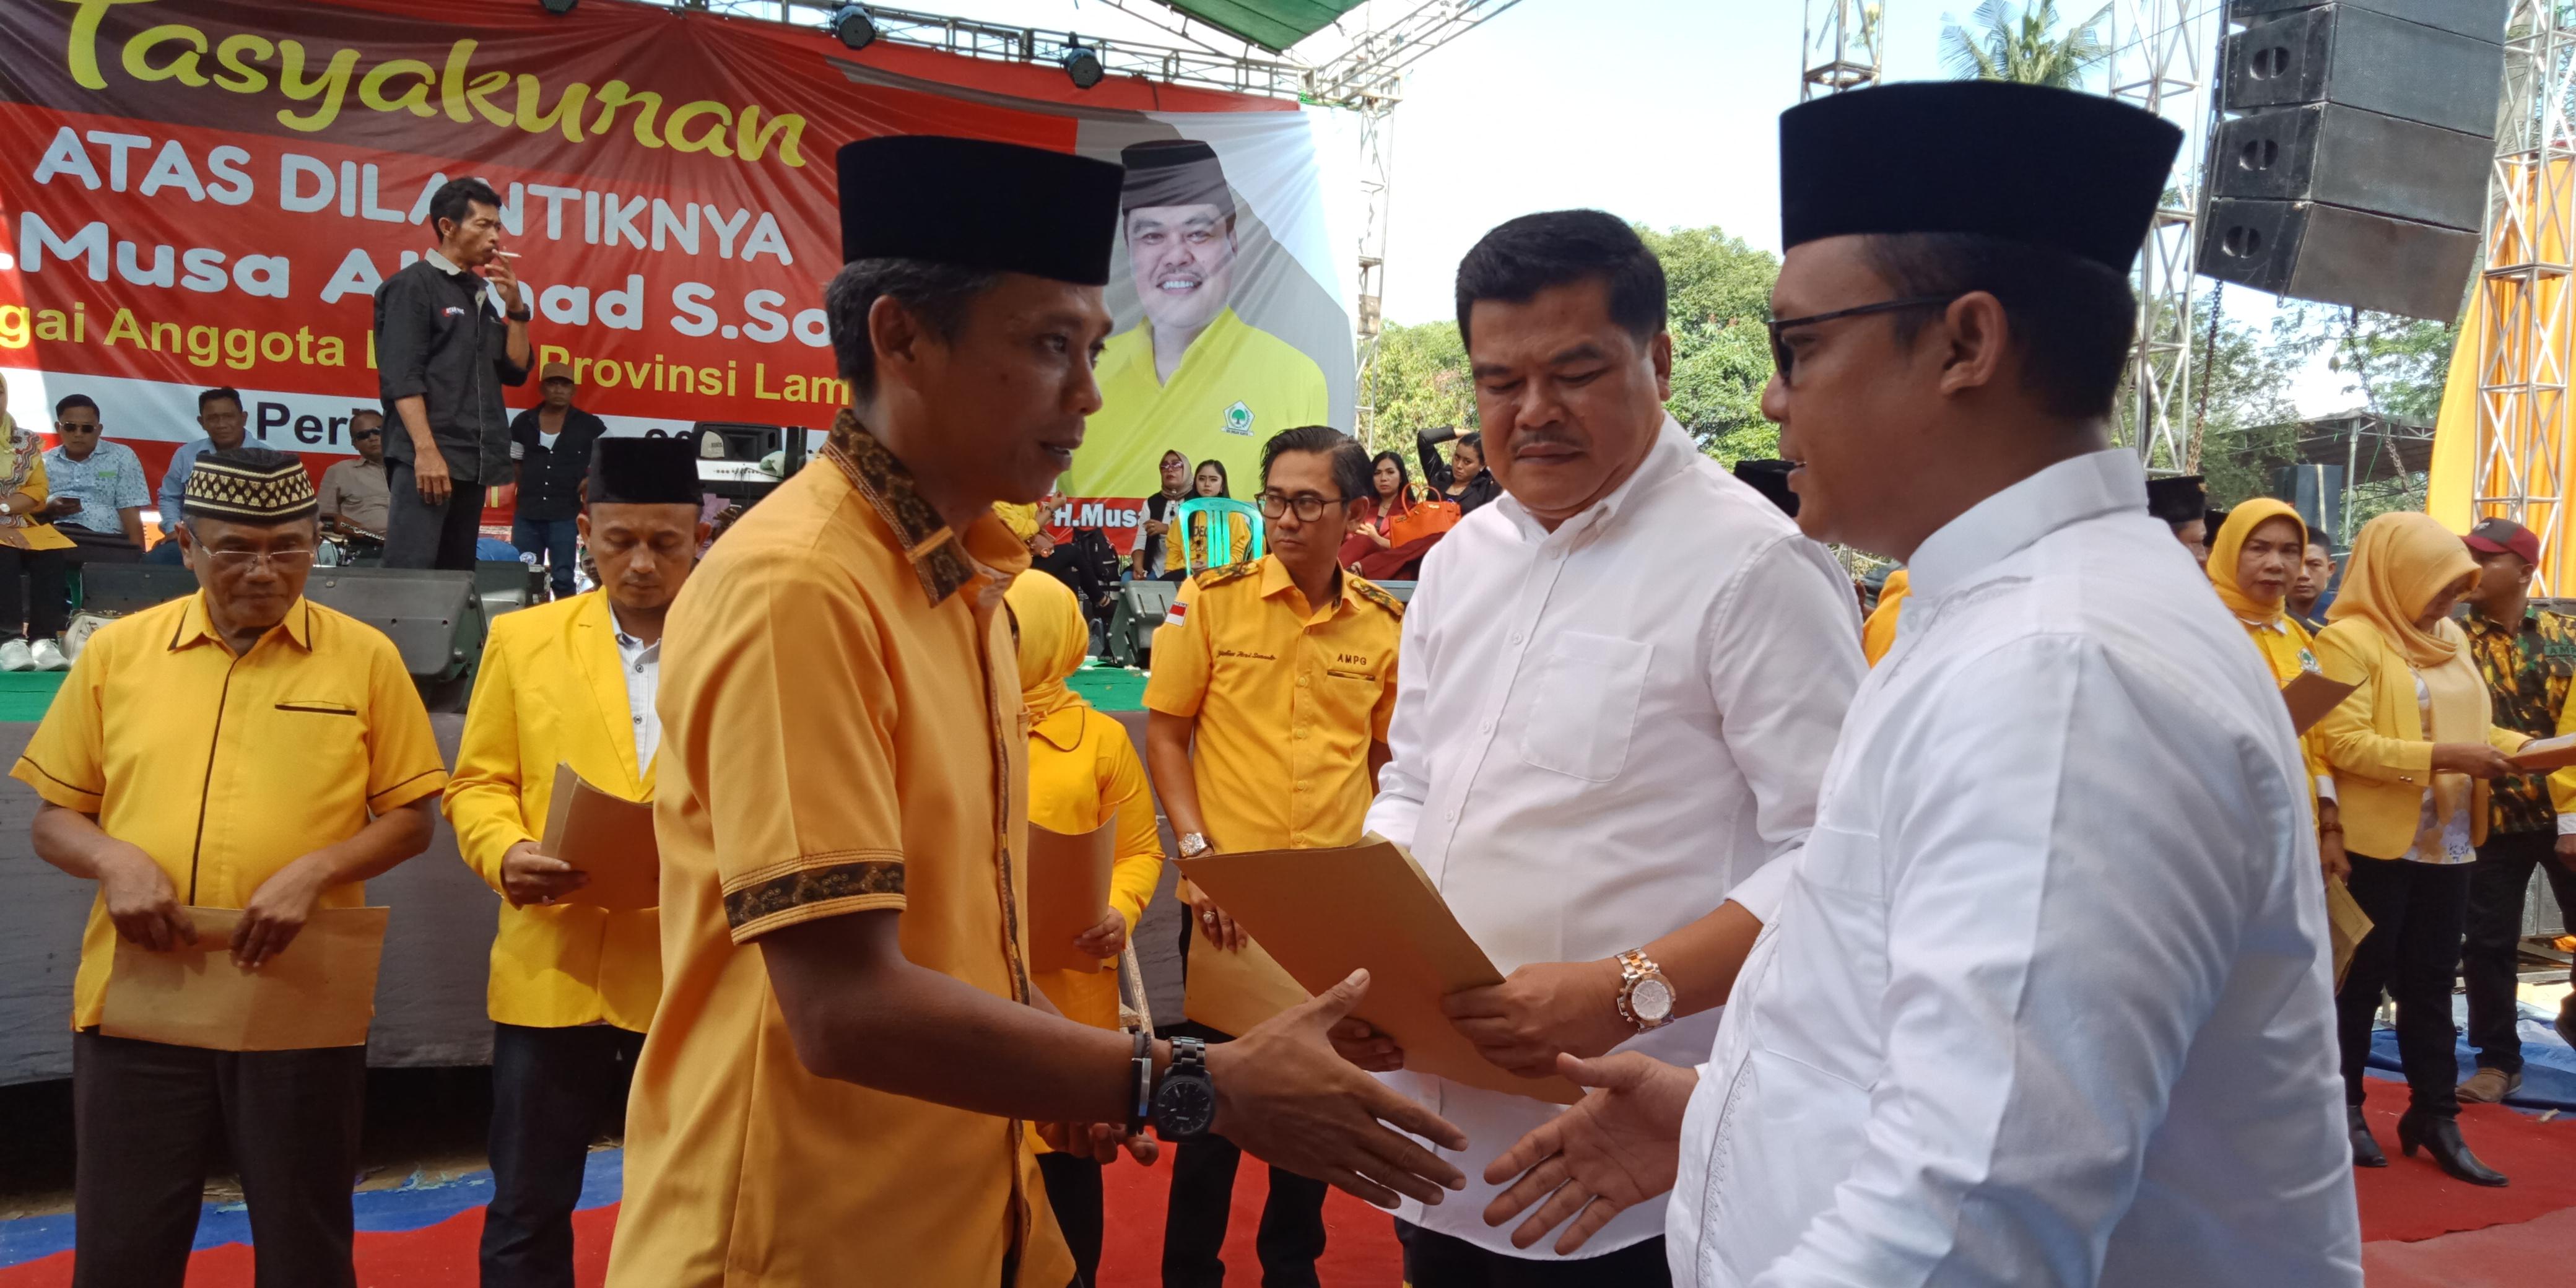 Baru Jadi Anggota DPRD, Masyarakat Minta Musa Ahmad Jadi Bupati Lamteng